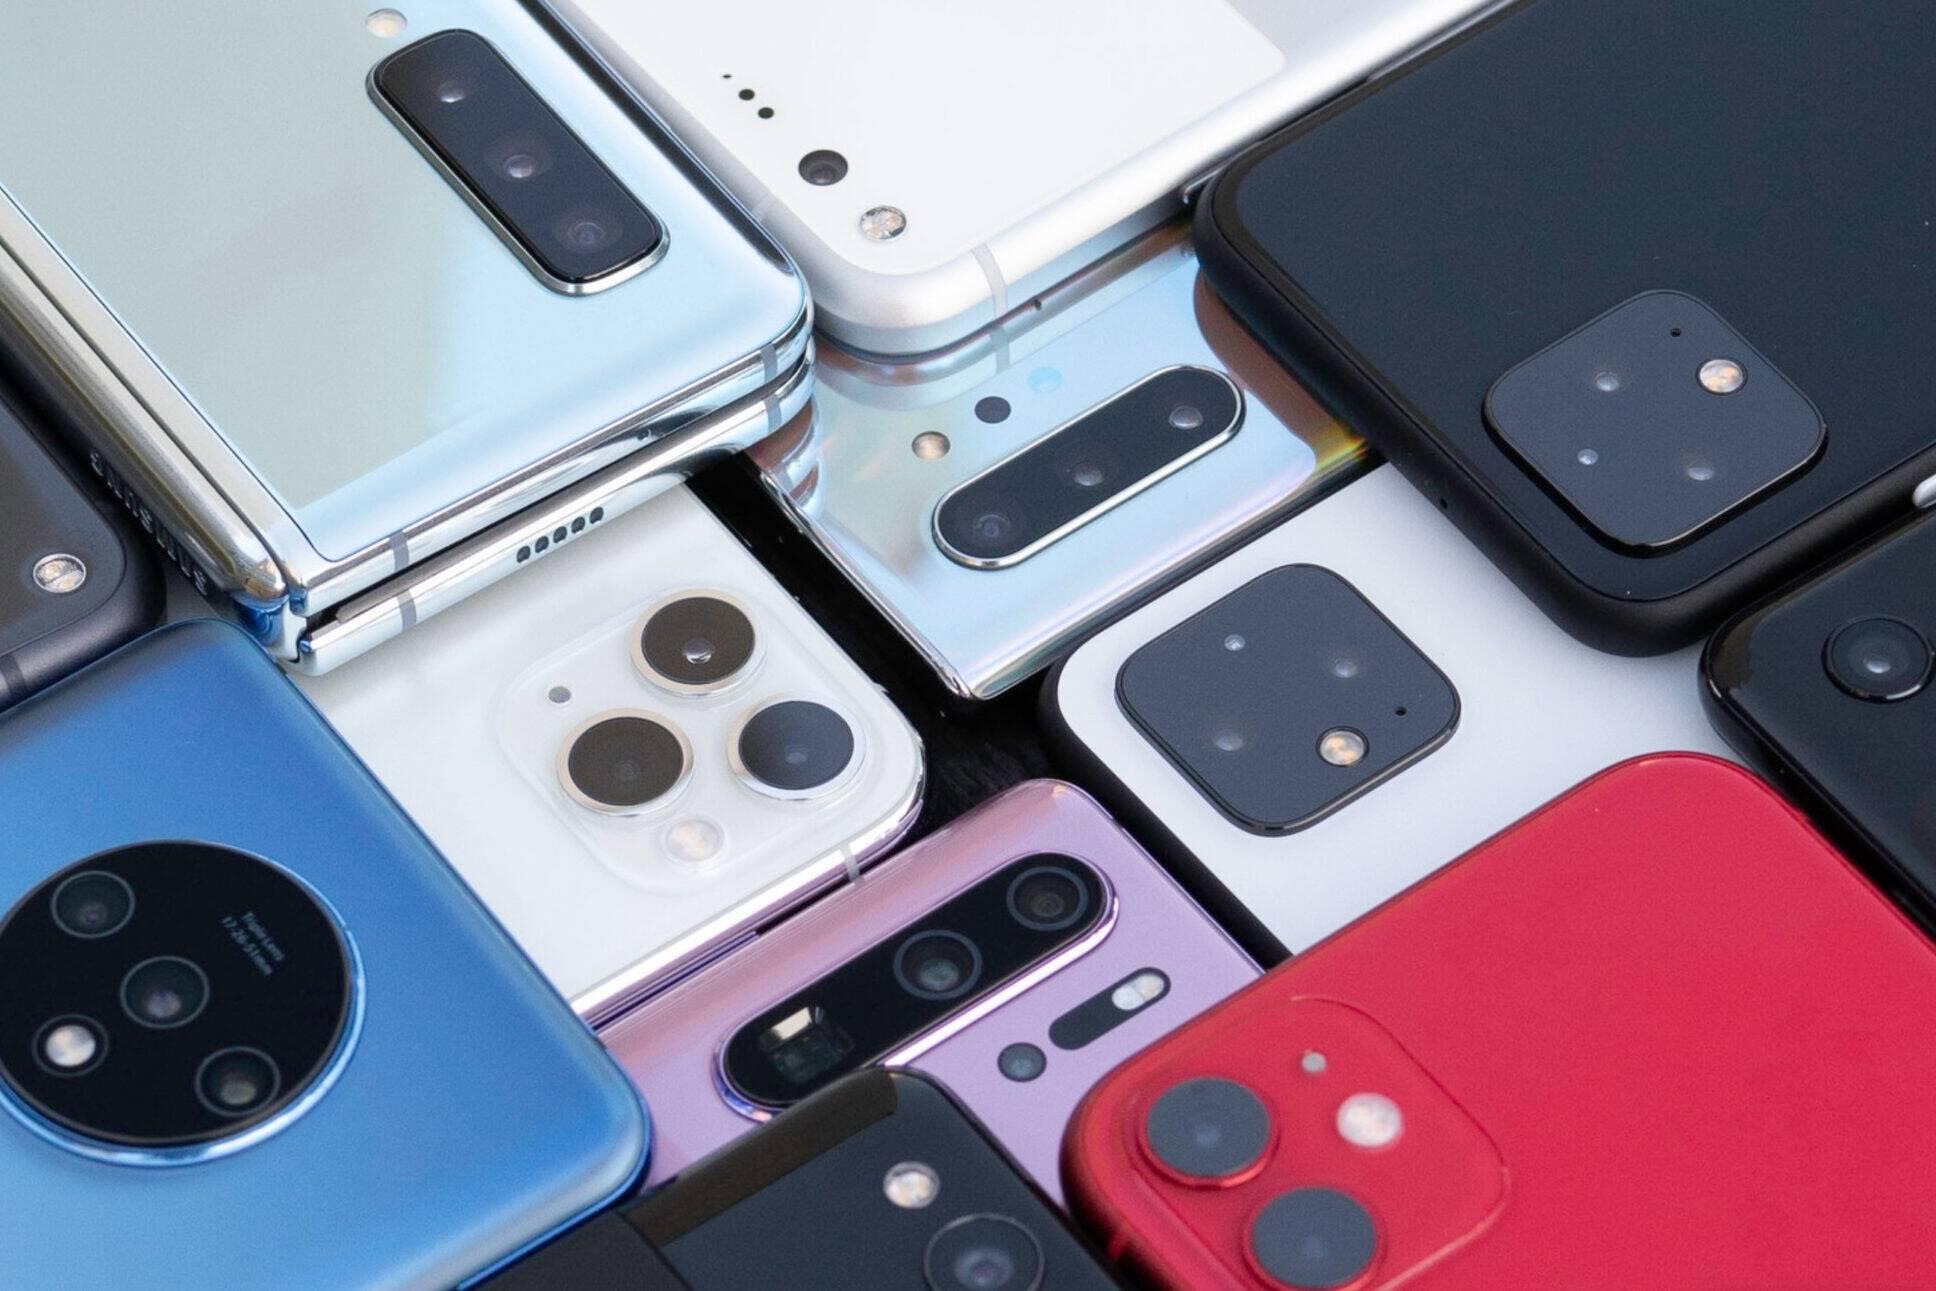 yenilenmiş android telefonlar